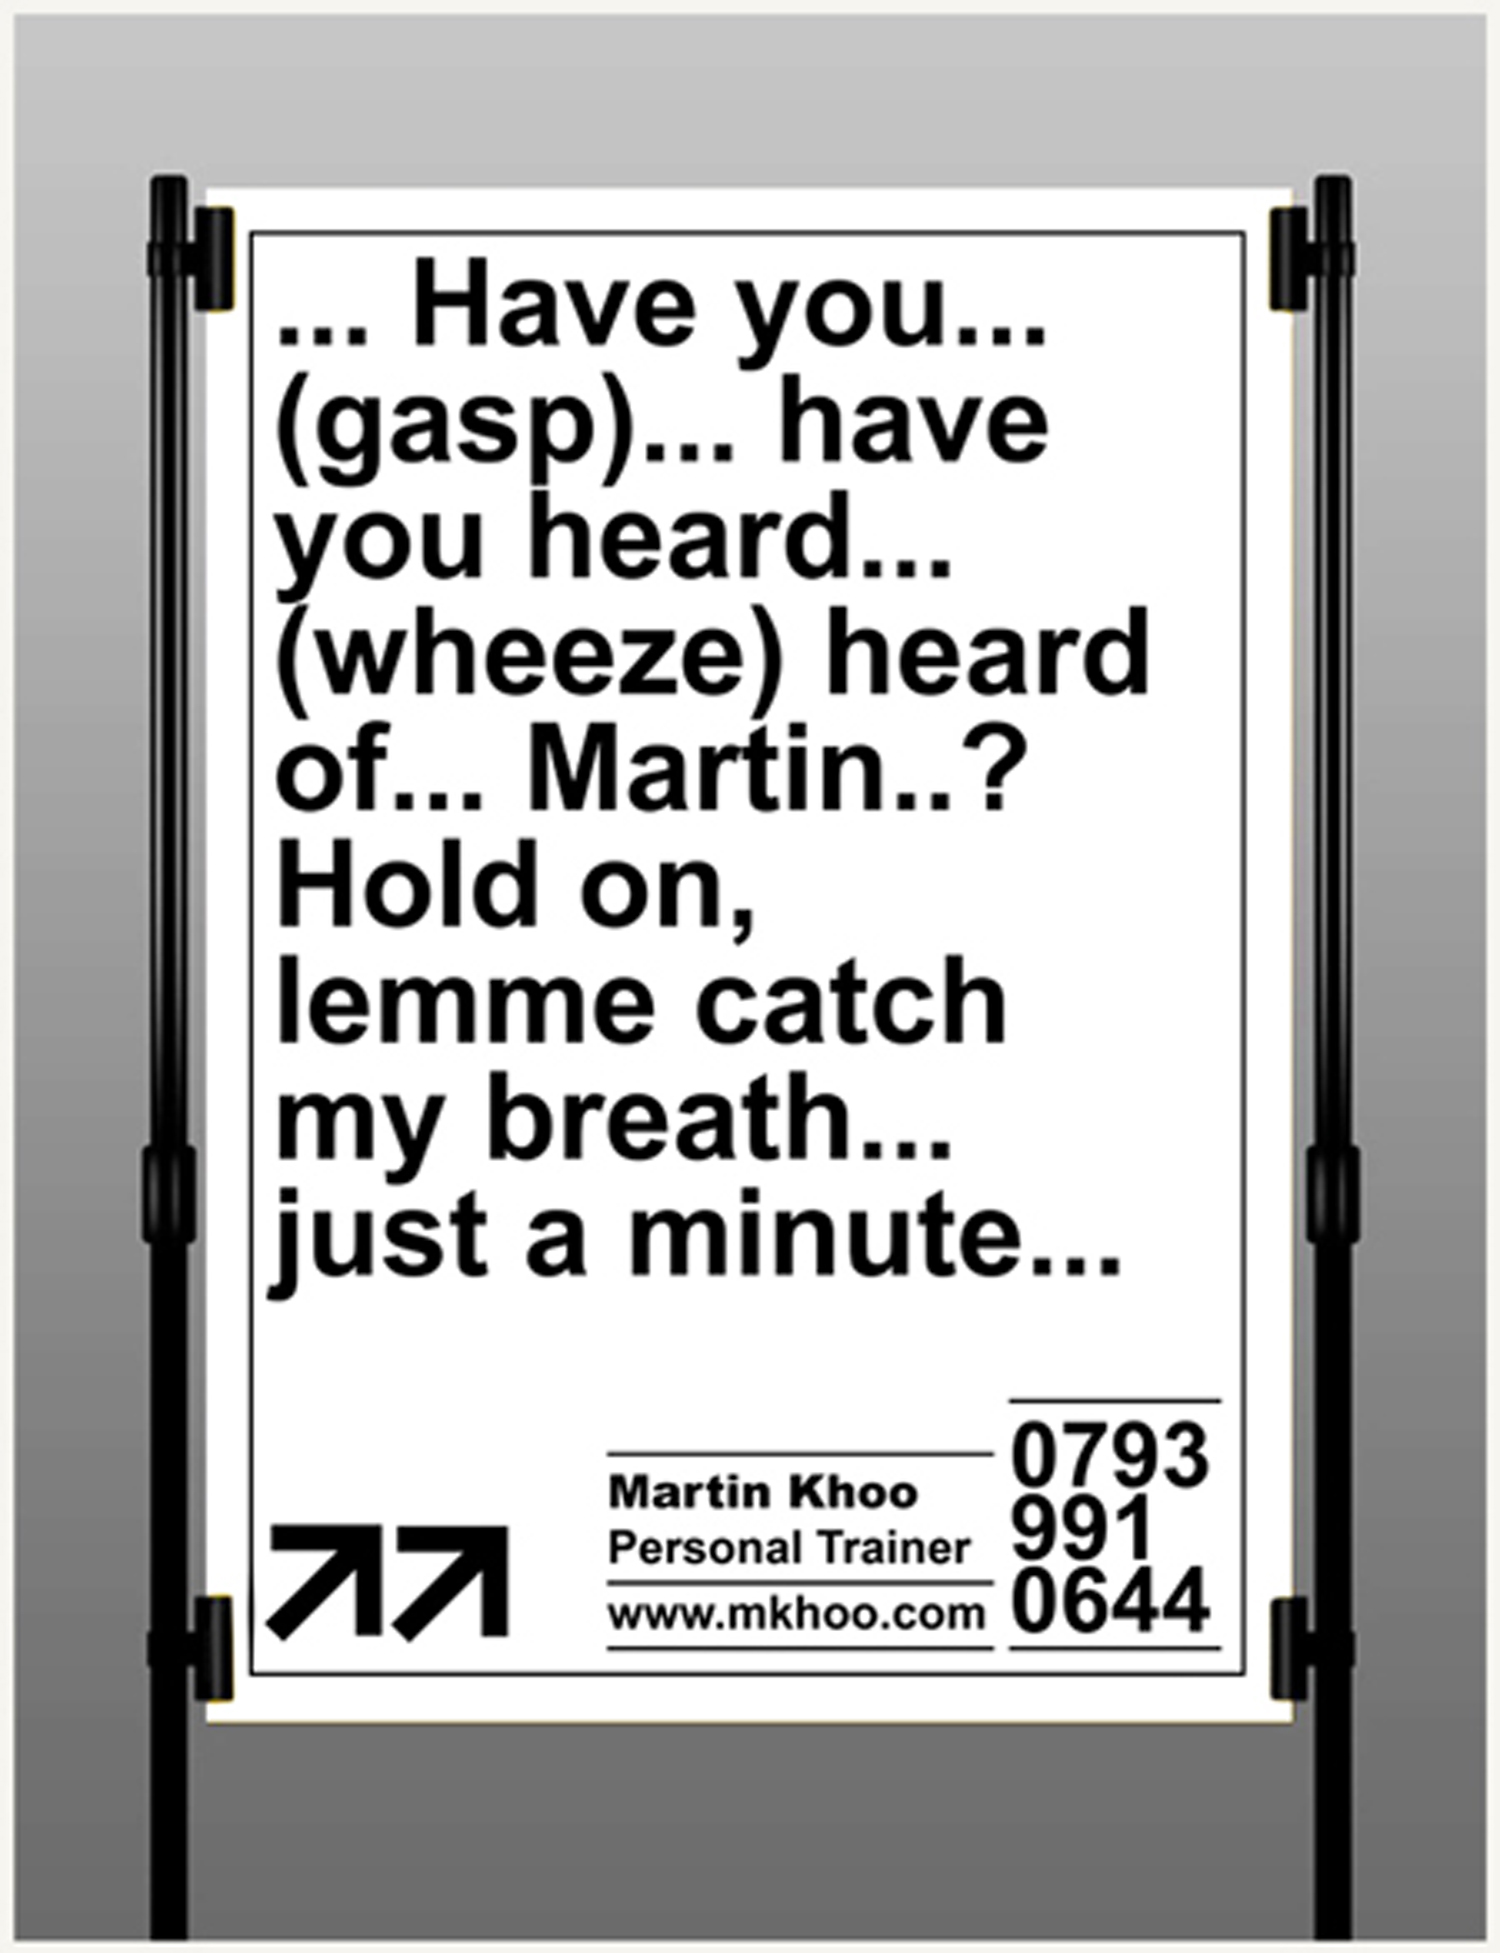 martinkhoo.jpg